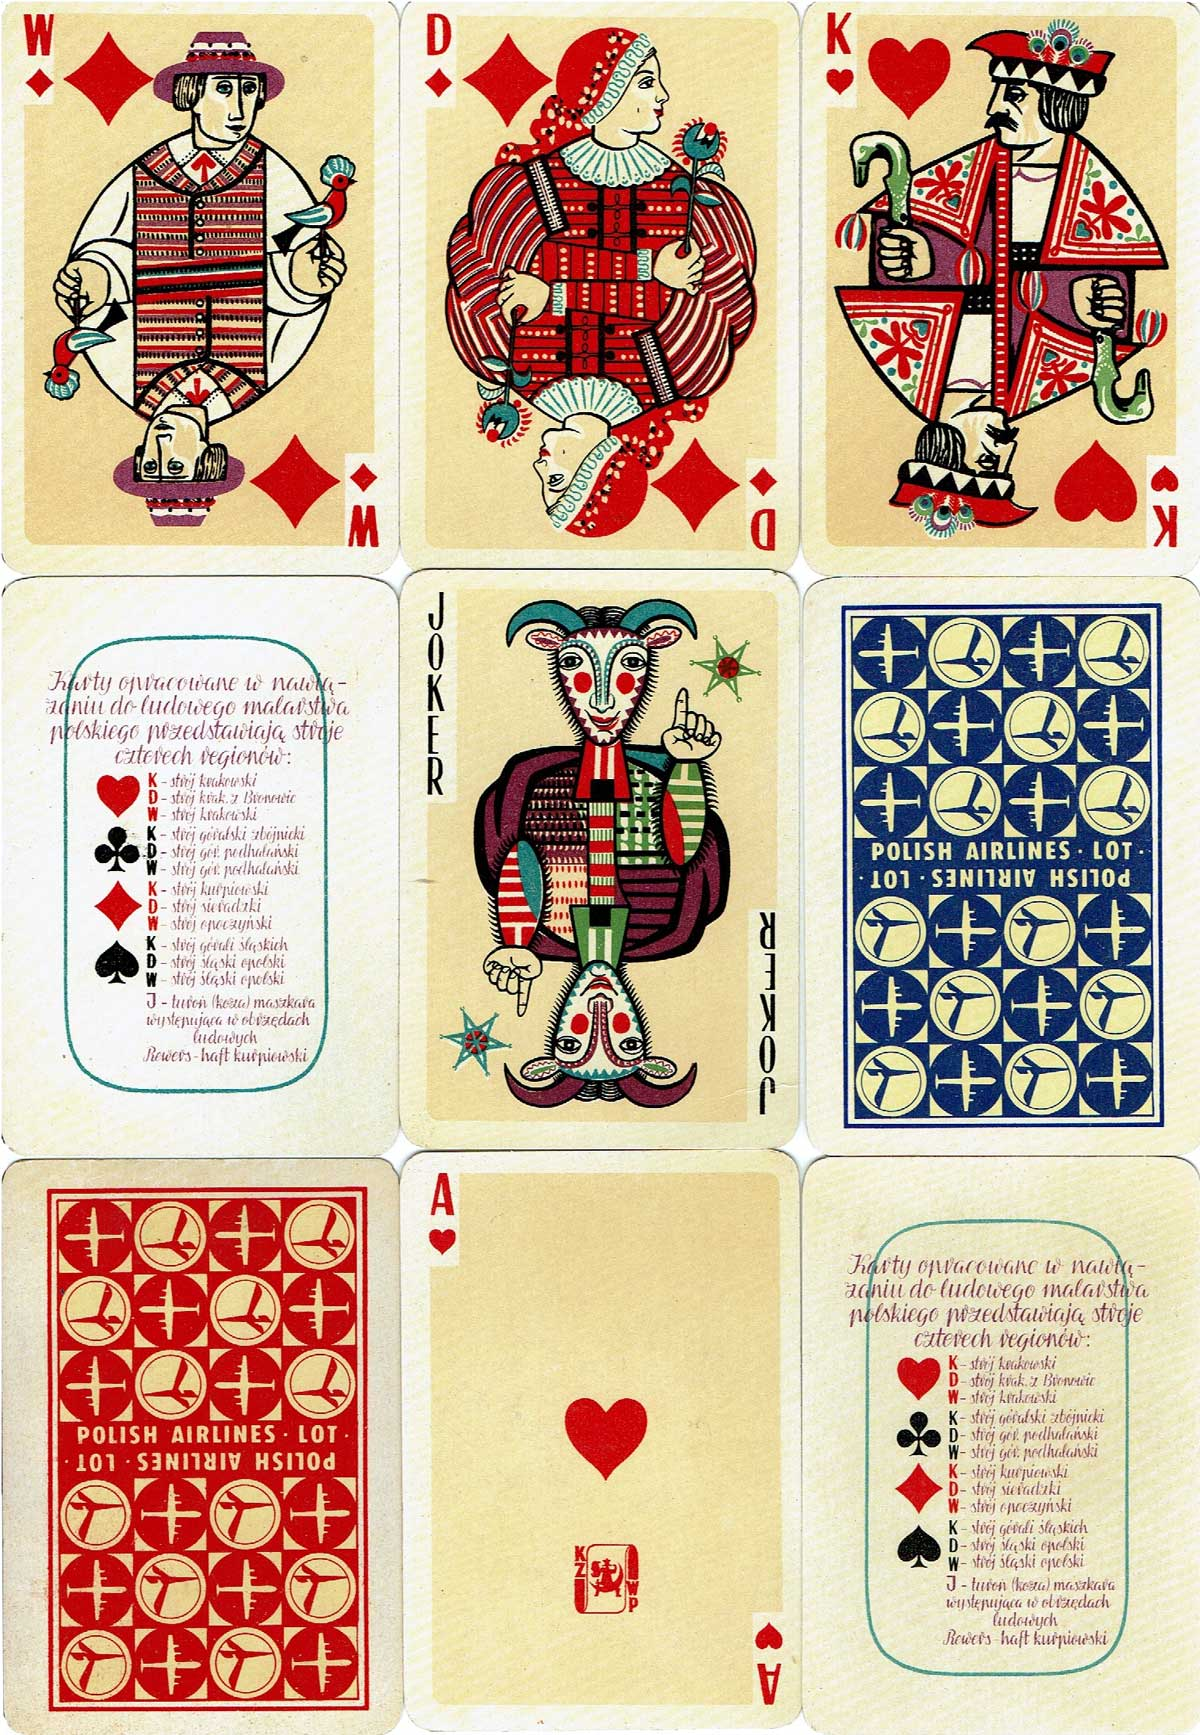 Folk Cards designed by Krystyna Gruchalska - Bunsch, 1962